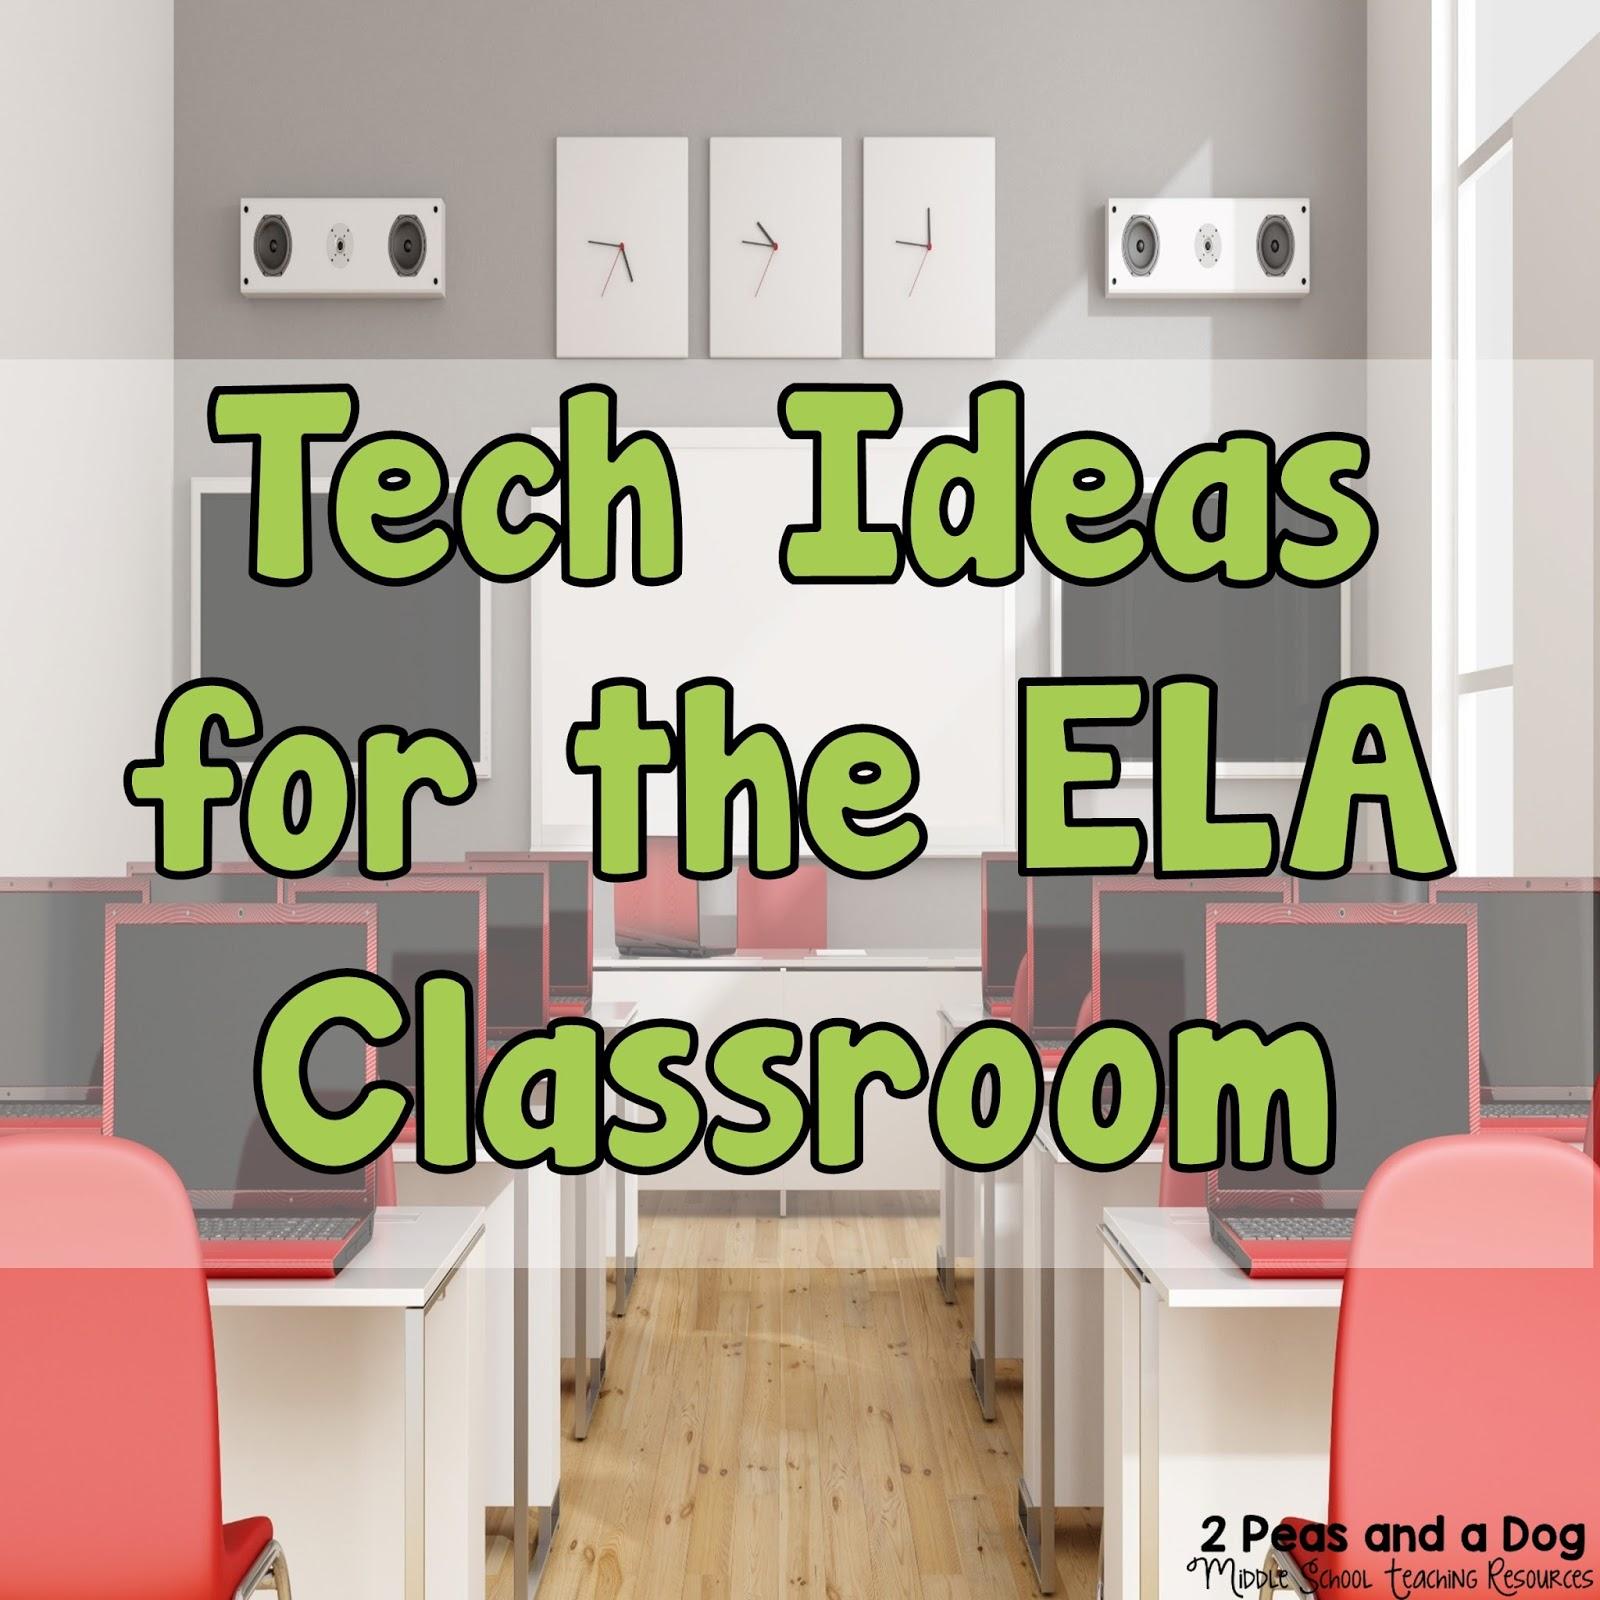 English Language Arts Classroom Decorations ~ Technology ideas for the english language arts classroom